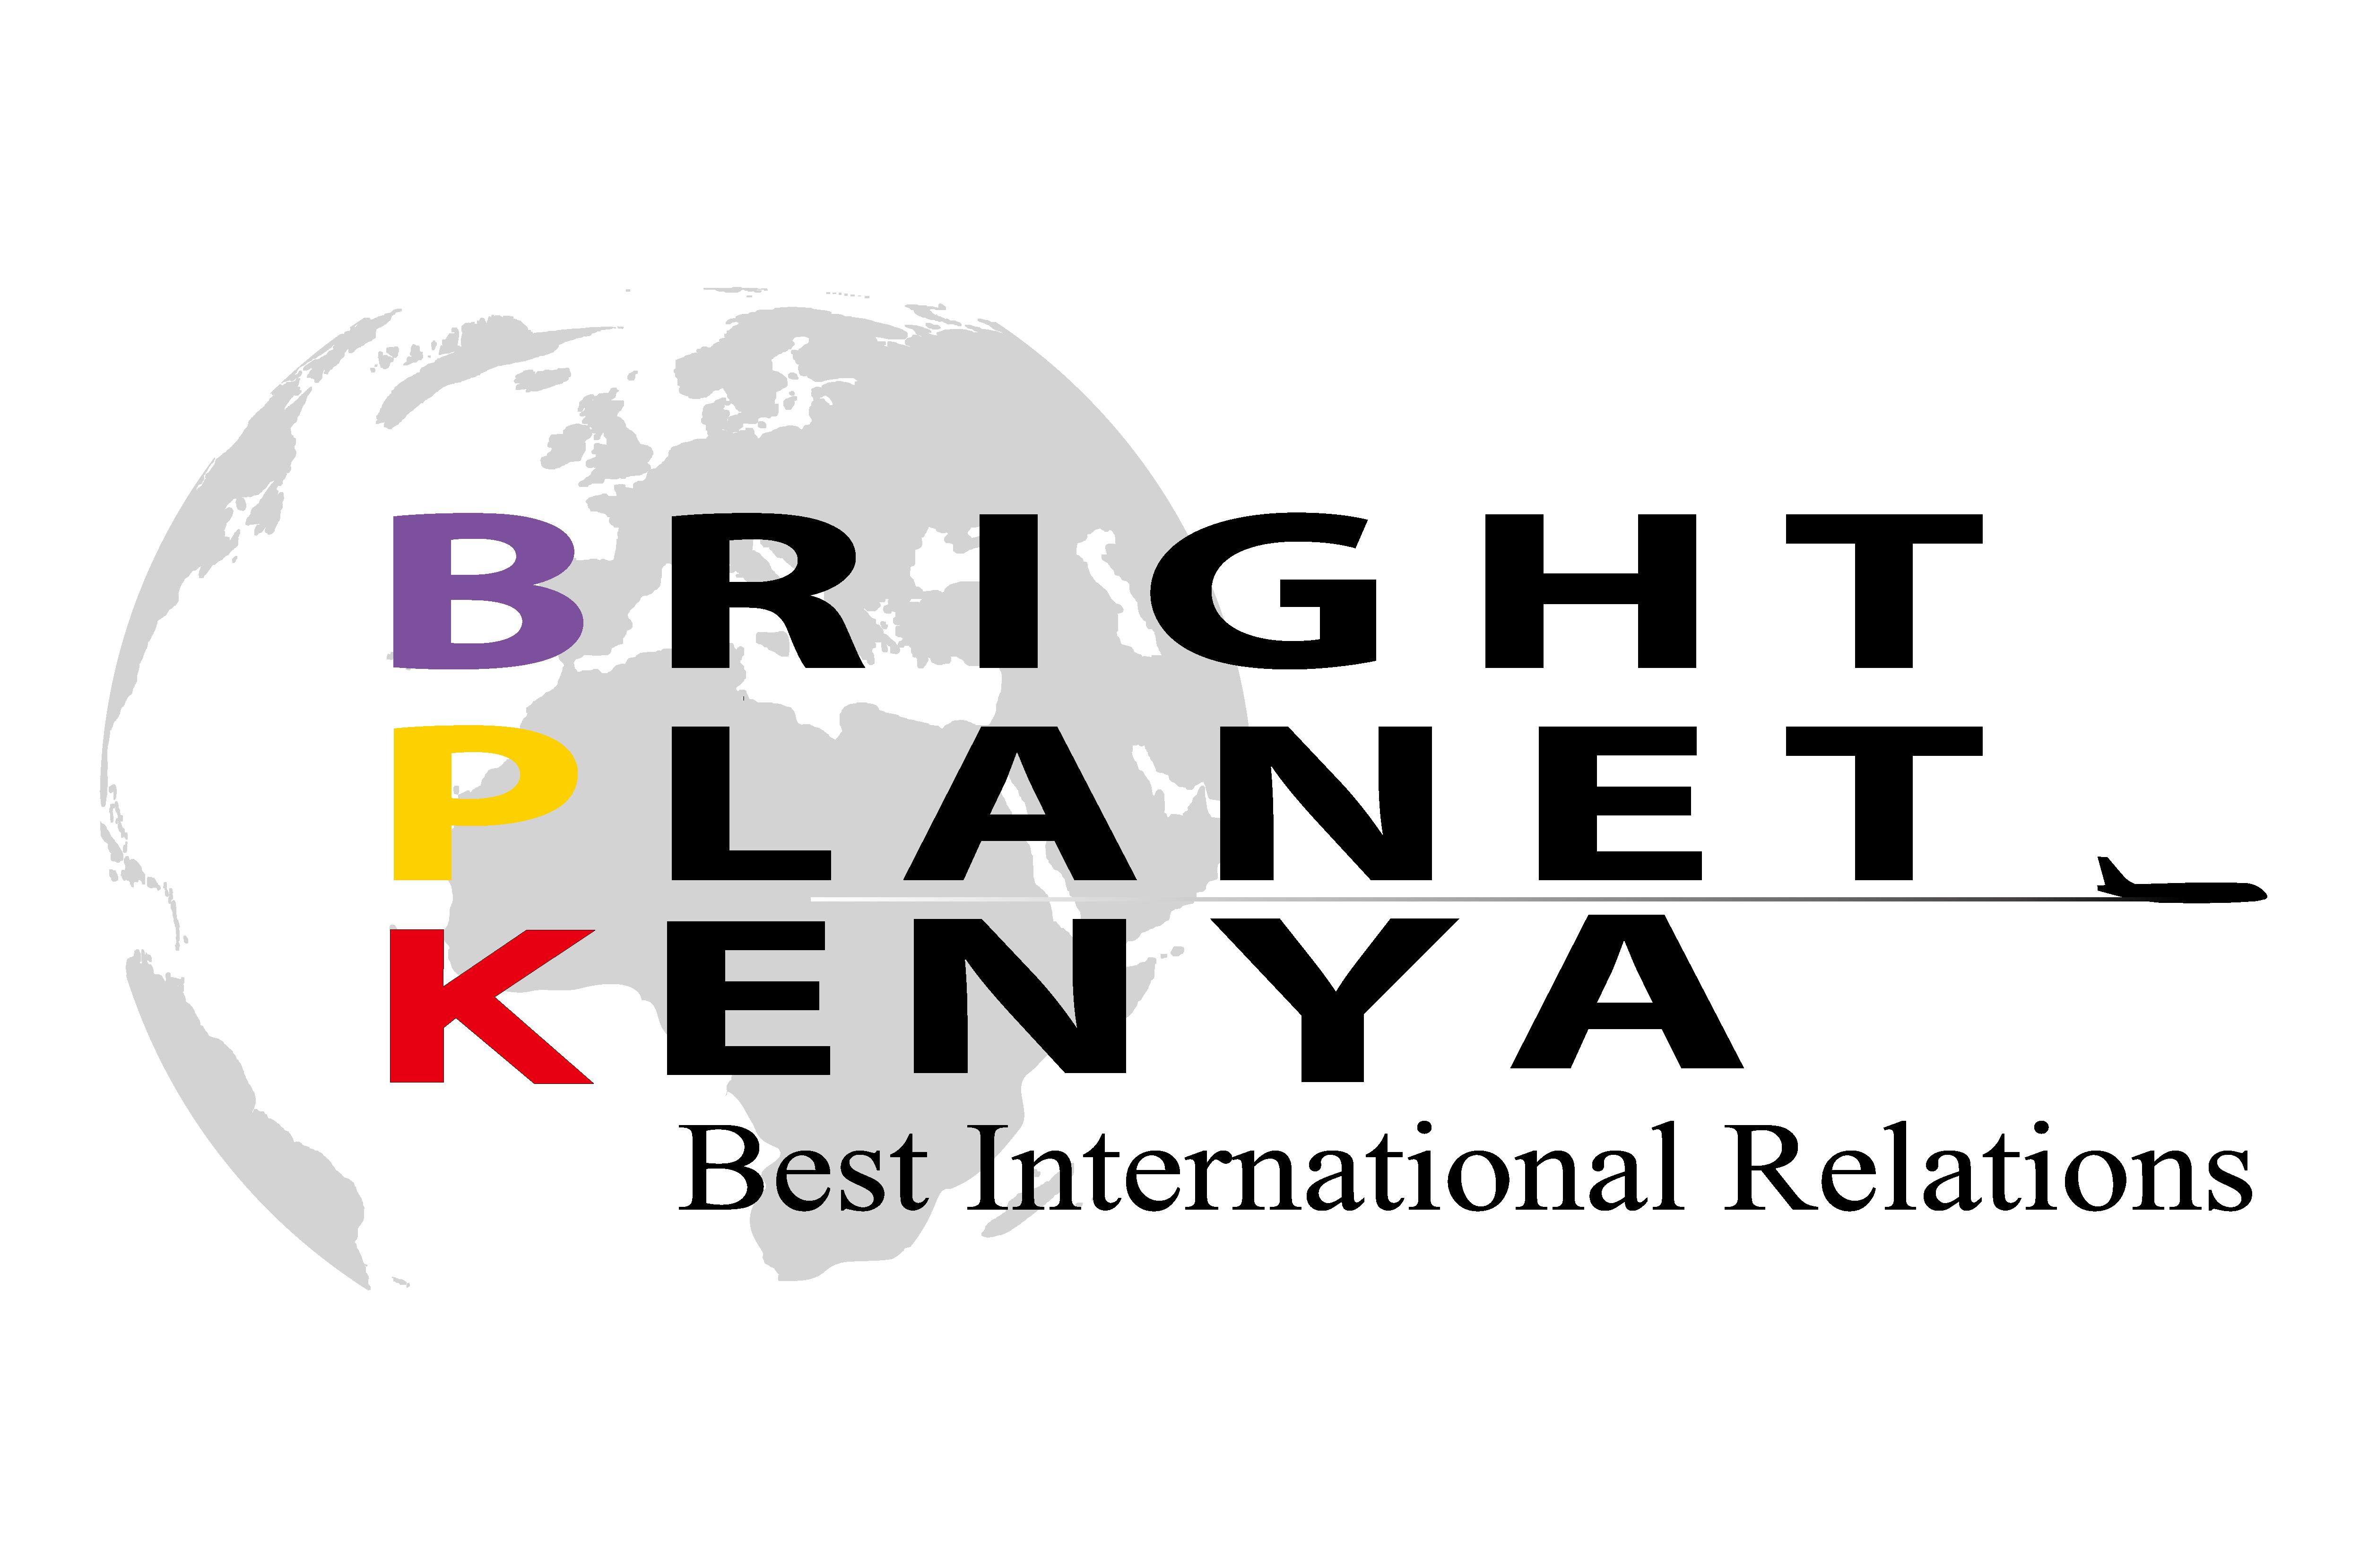 BRIGHTPLANET KENYA